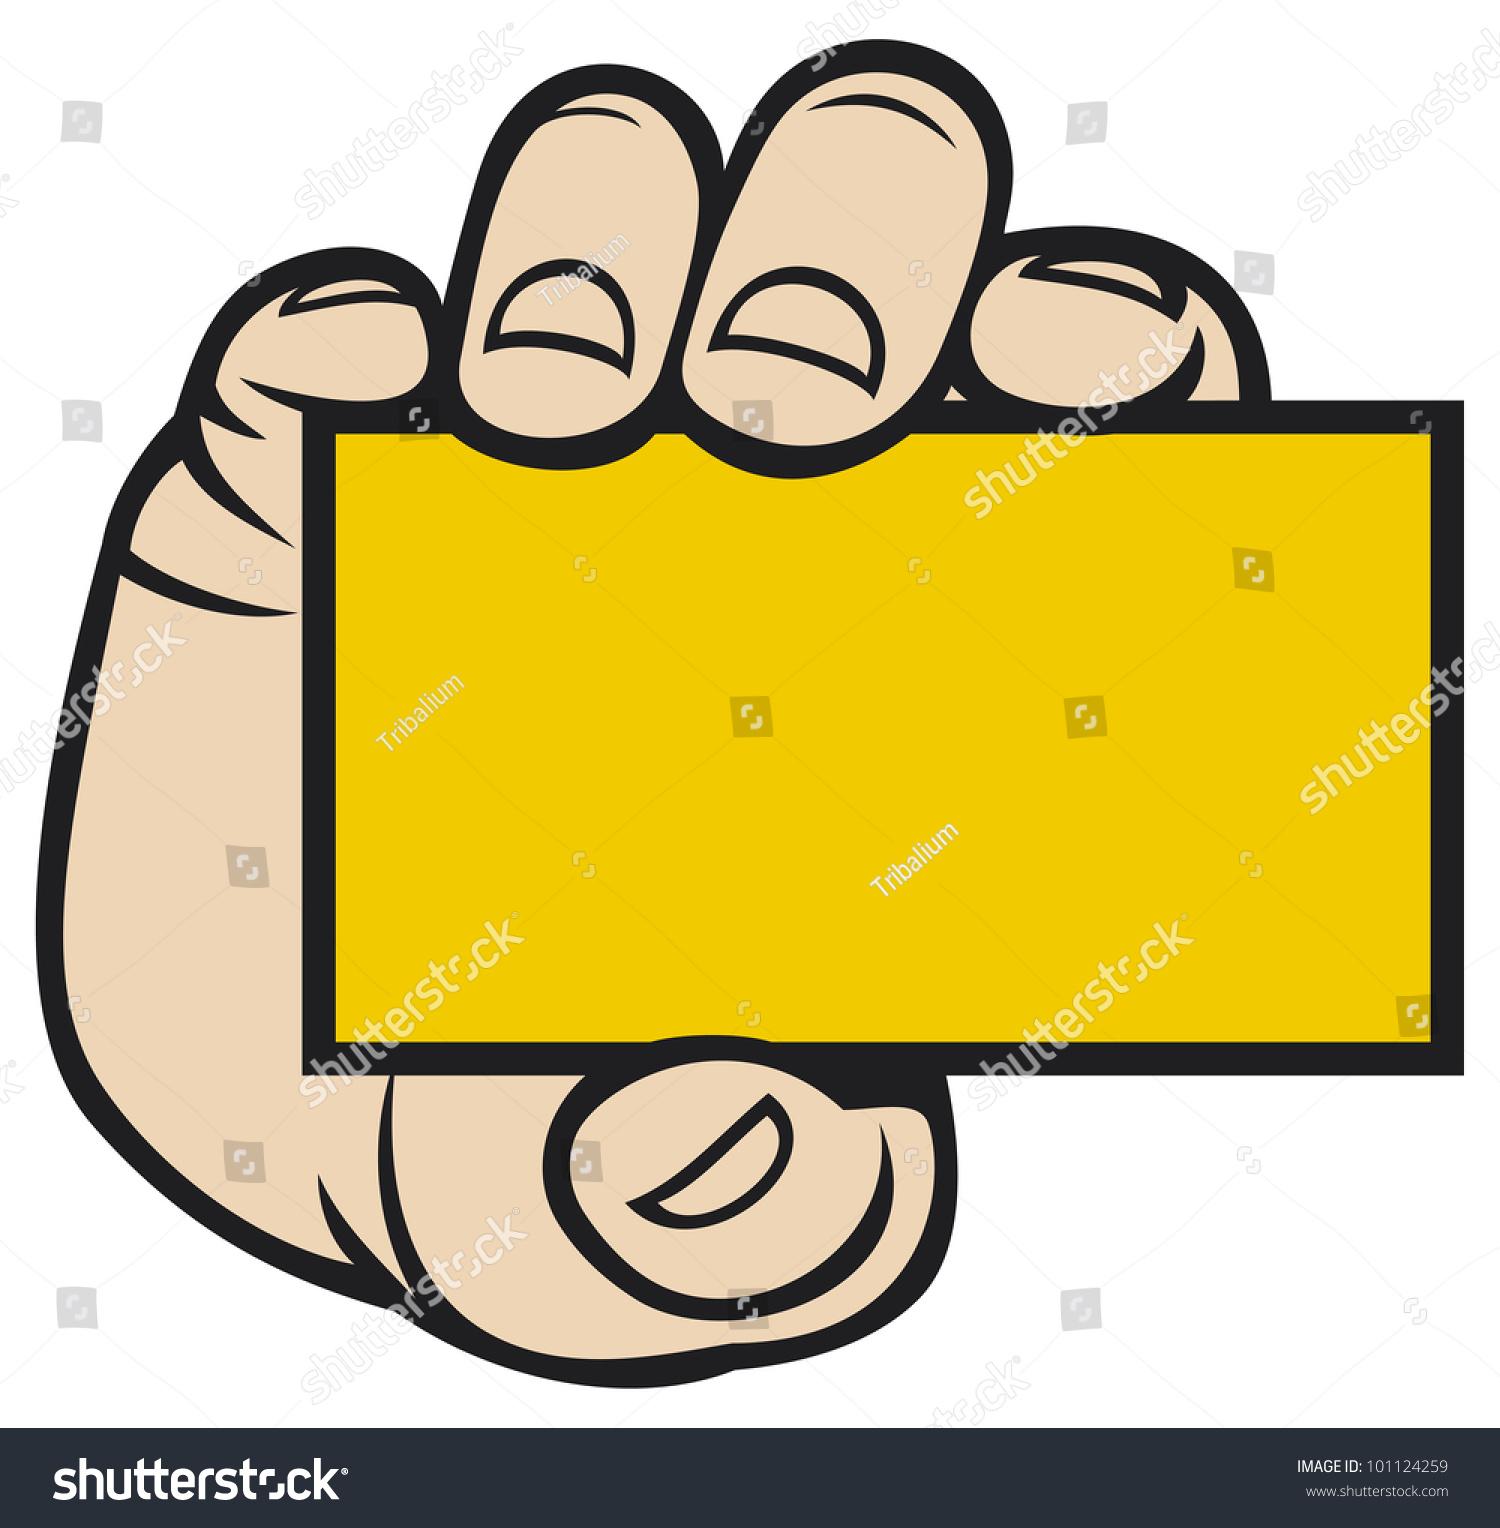 Hand Holding Business Card Stock Illustration 101124259 - Shutterstock